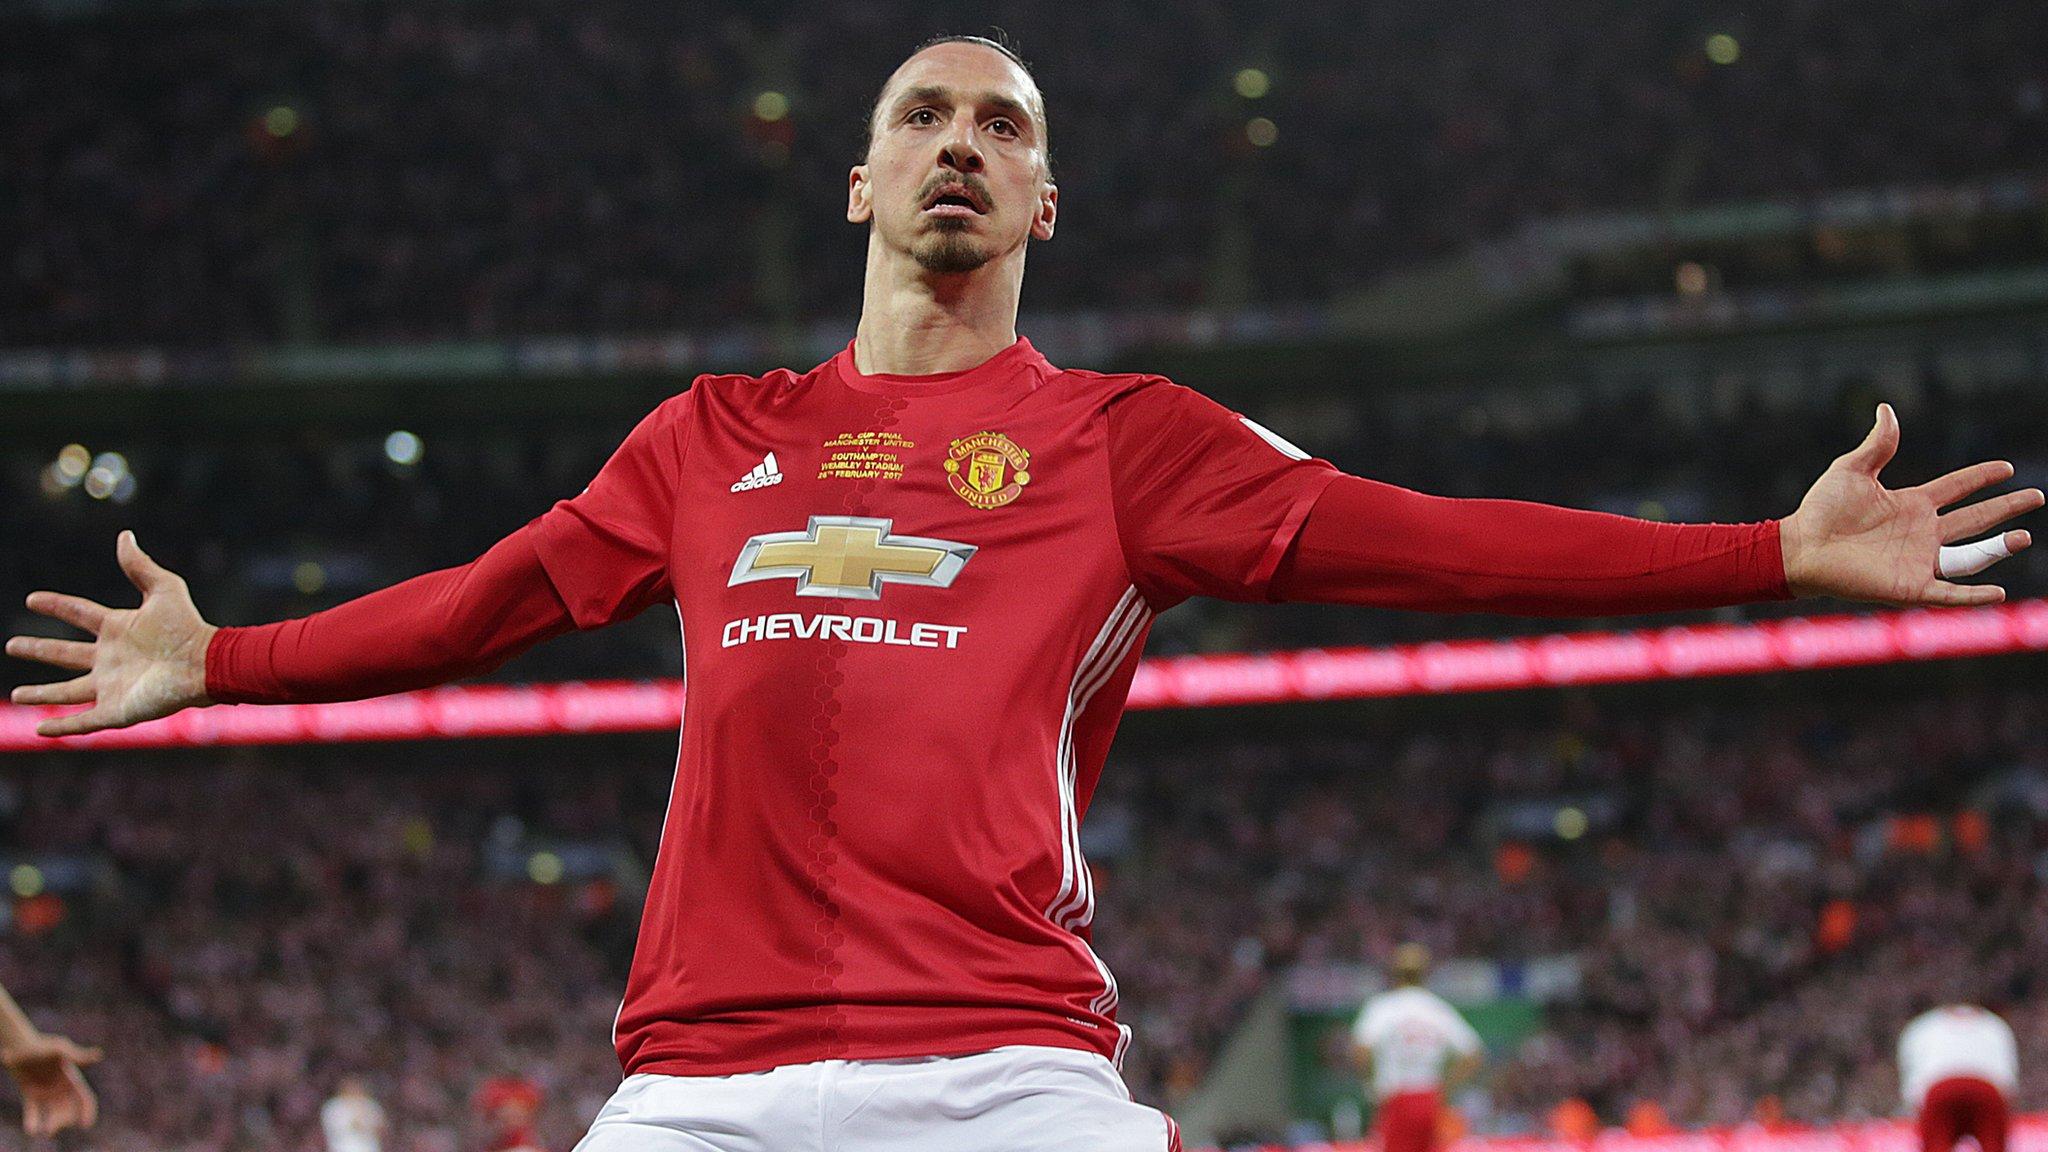 Ibrahimovic strikes late to win EFL Cup for Man Utd